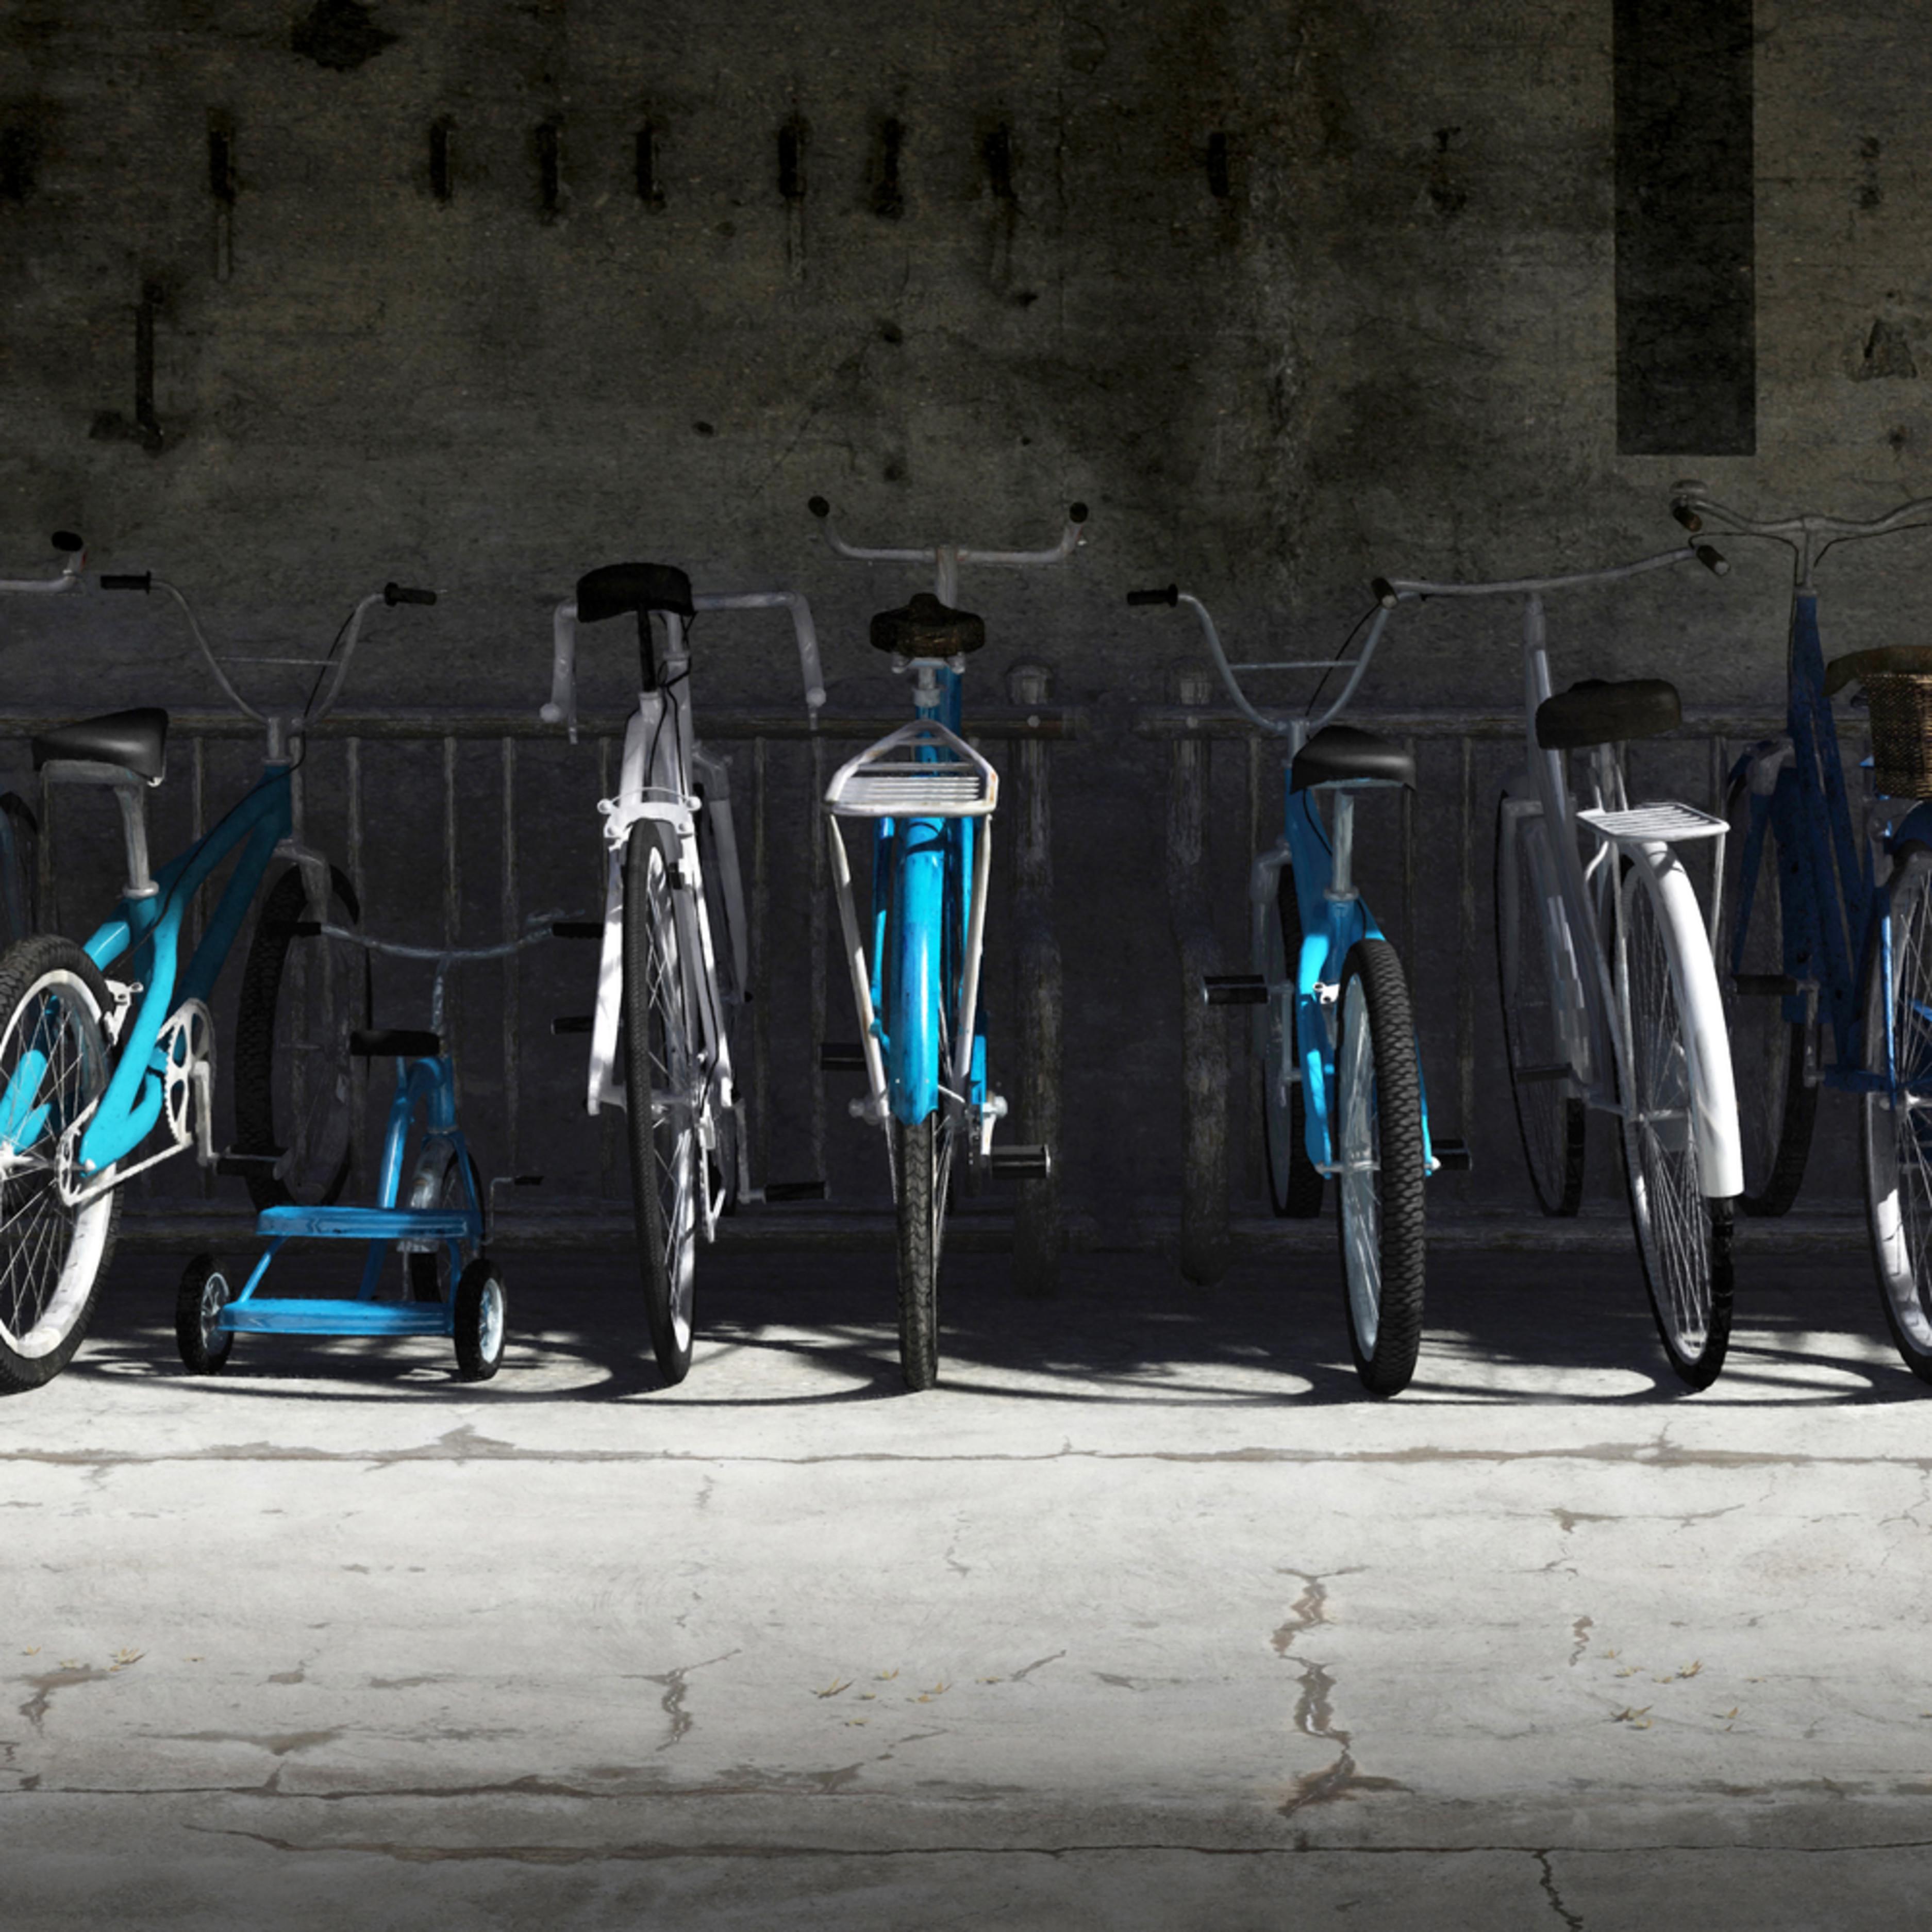 Cdecker bikerack blue 8000 advycv